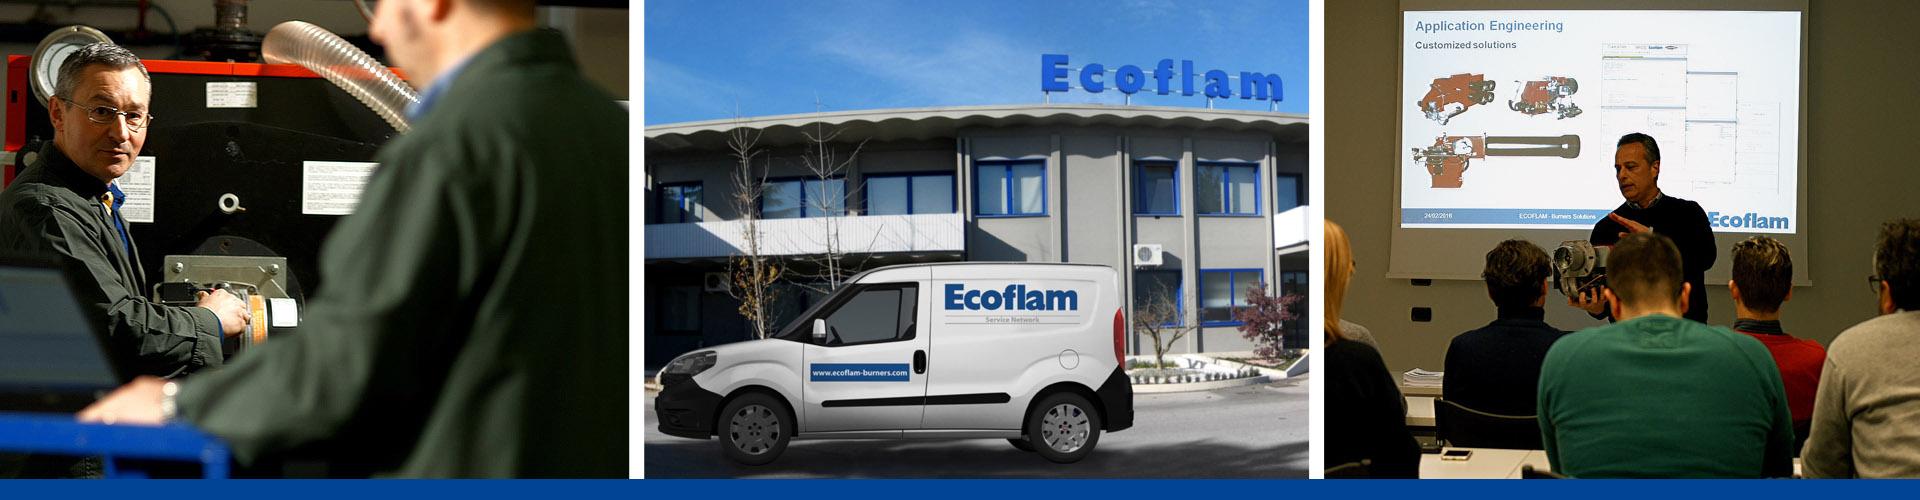 Ecoflam Service